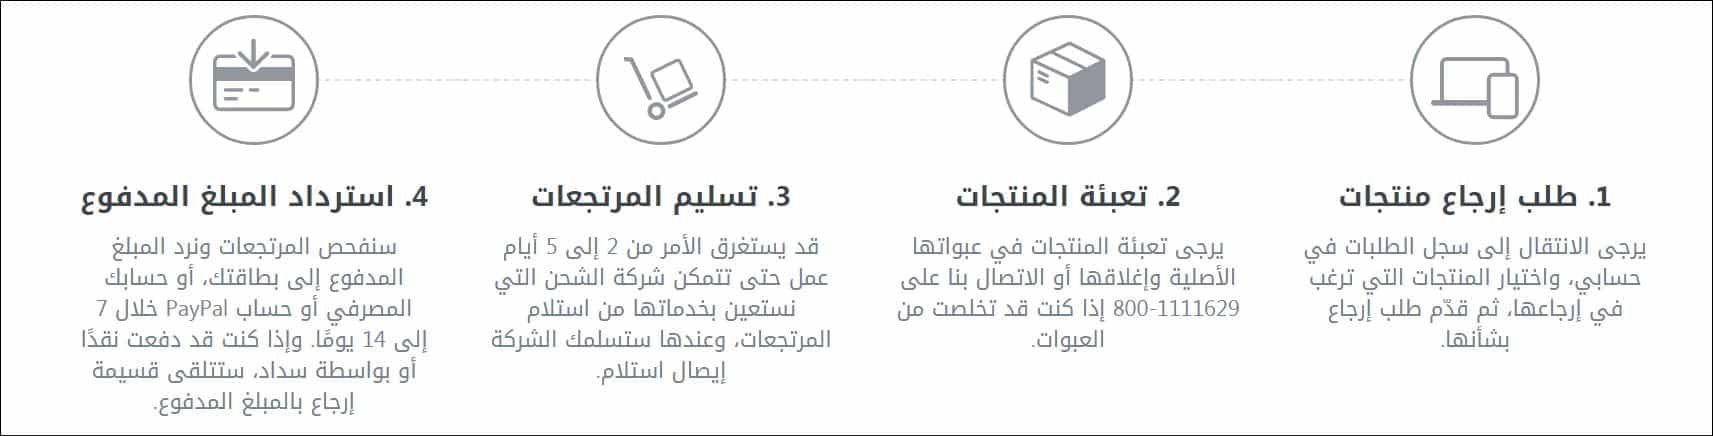 citymax السعودية خطوات الارجاع عبر الانترنت